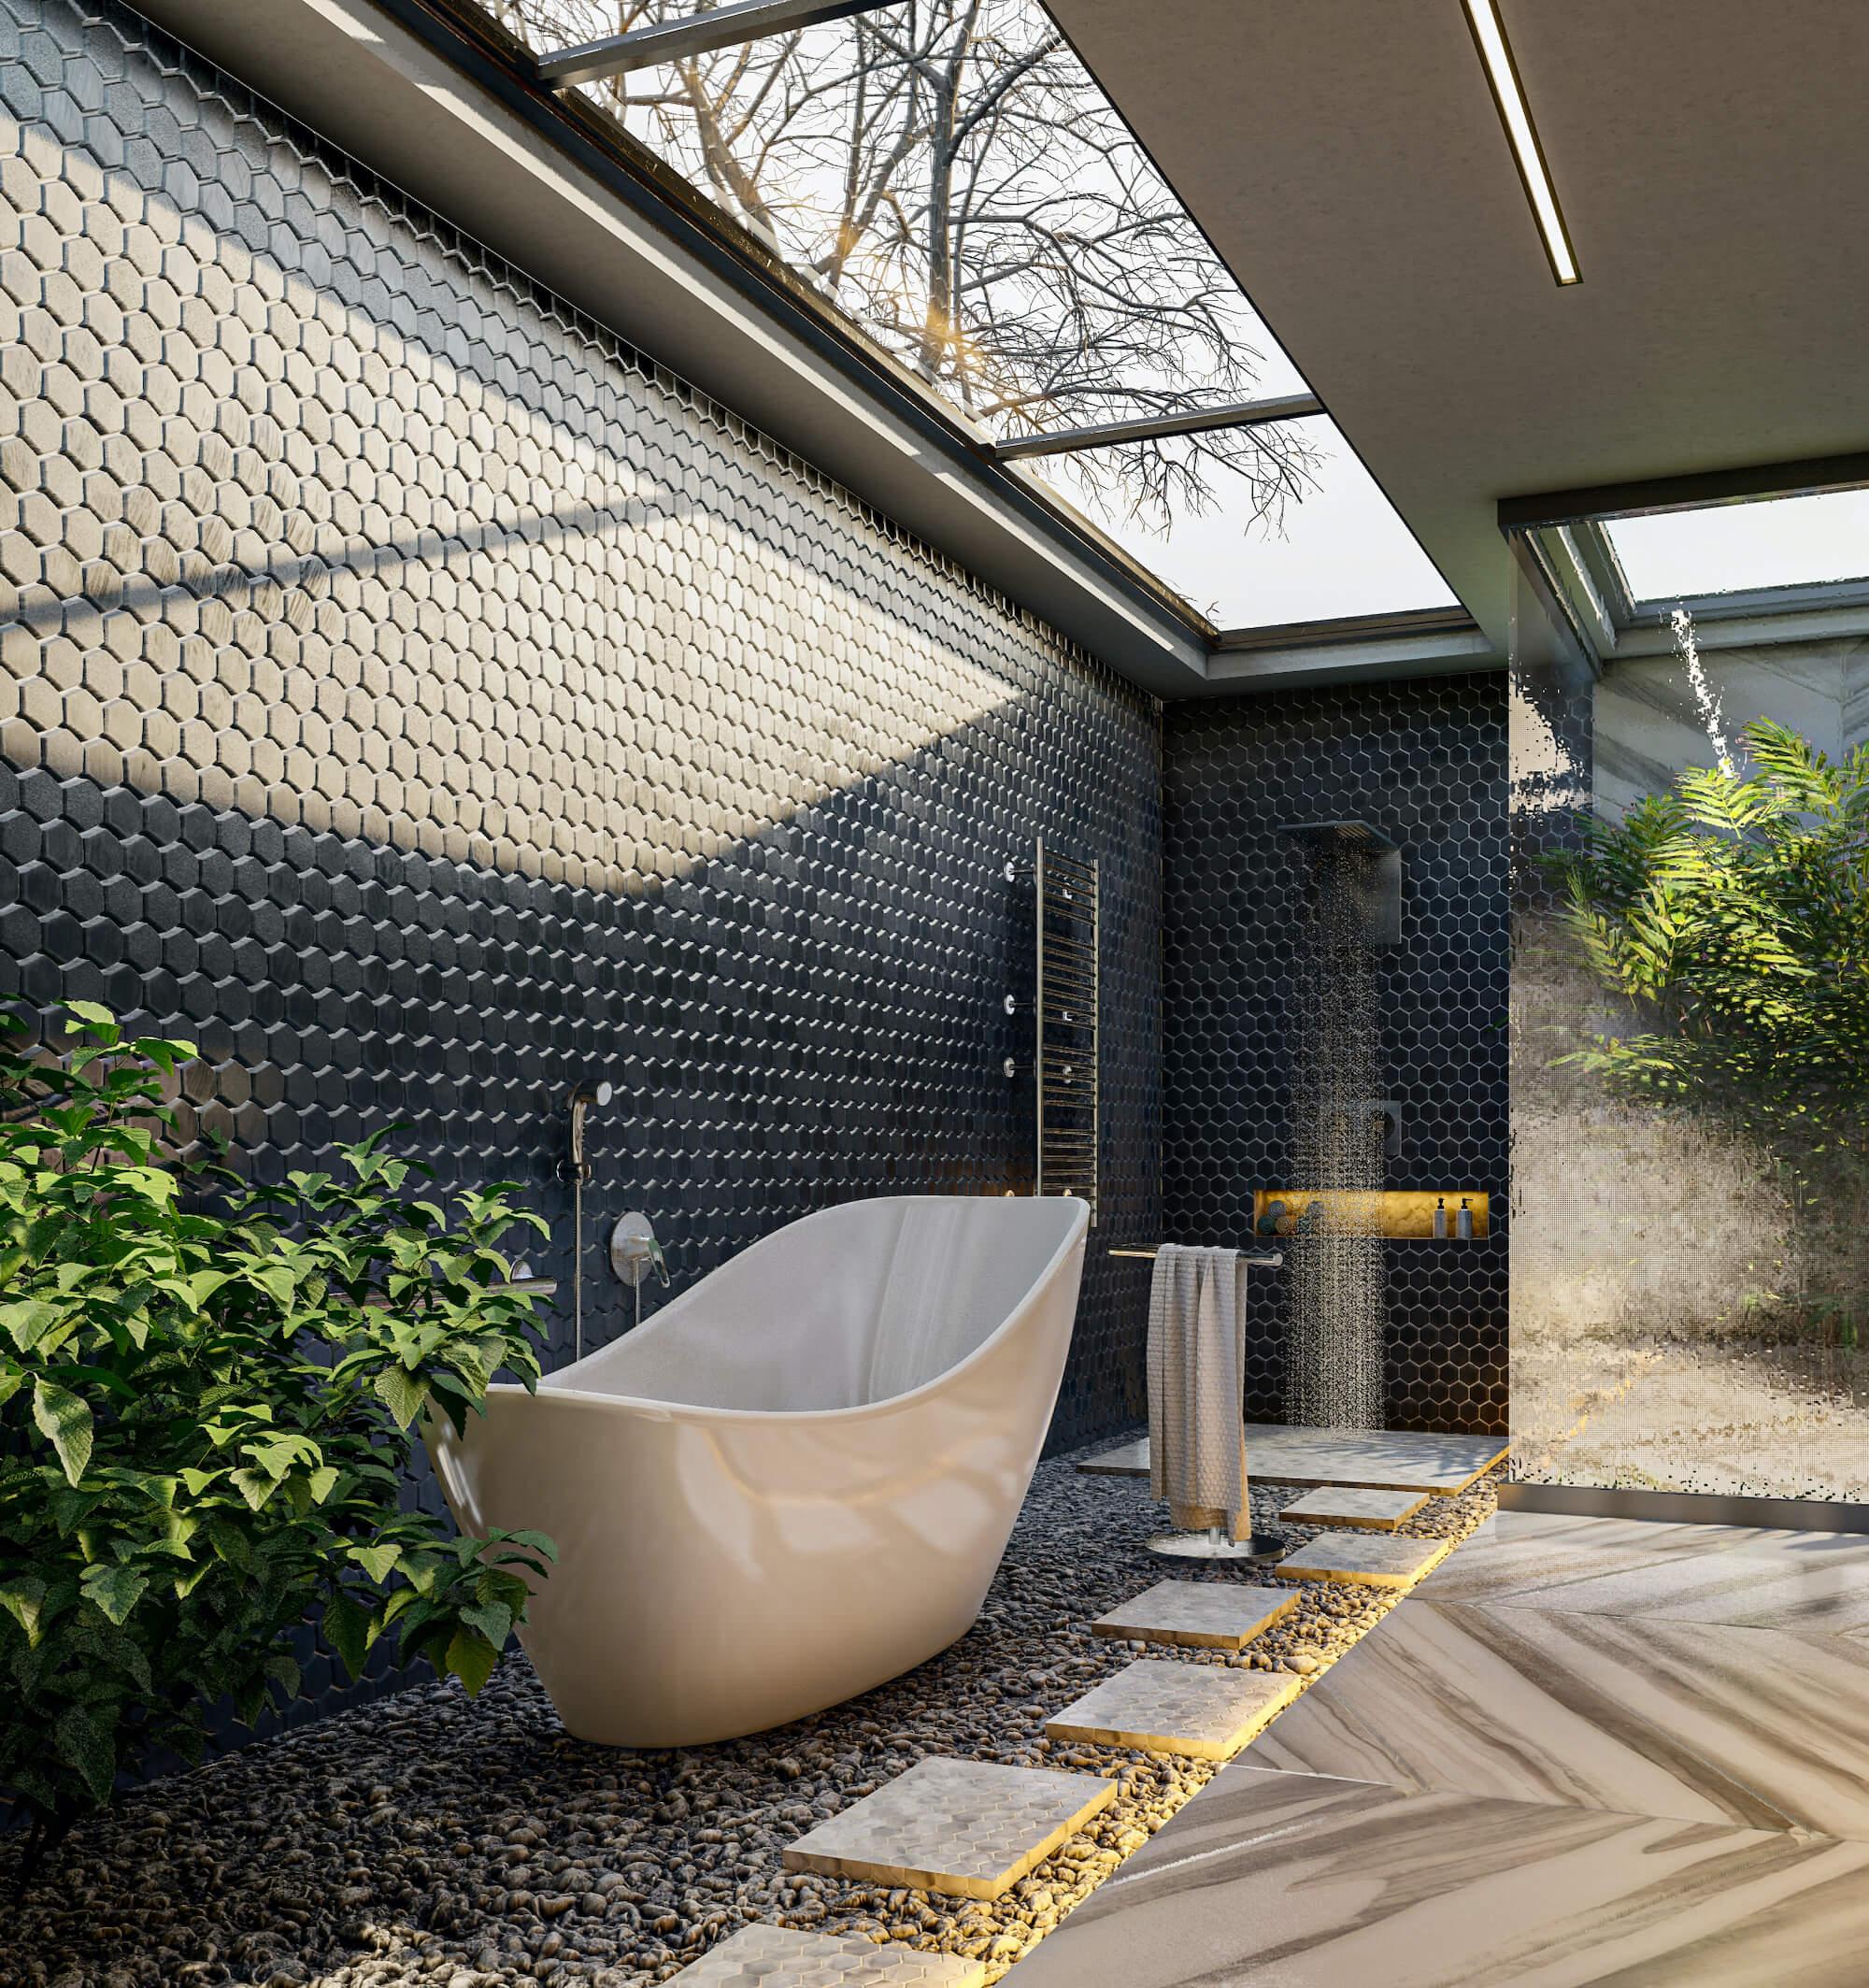 How Can I Make My Bathroom Look More Modern?